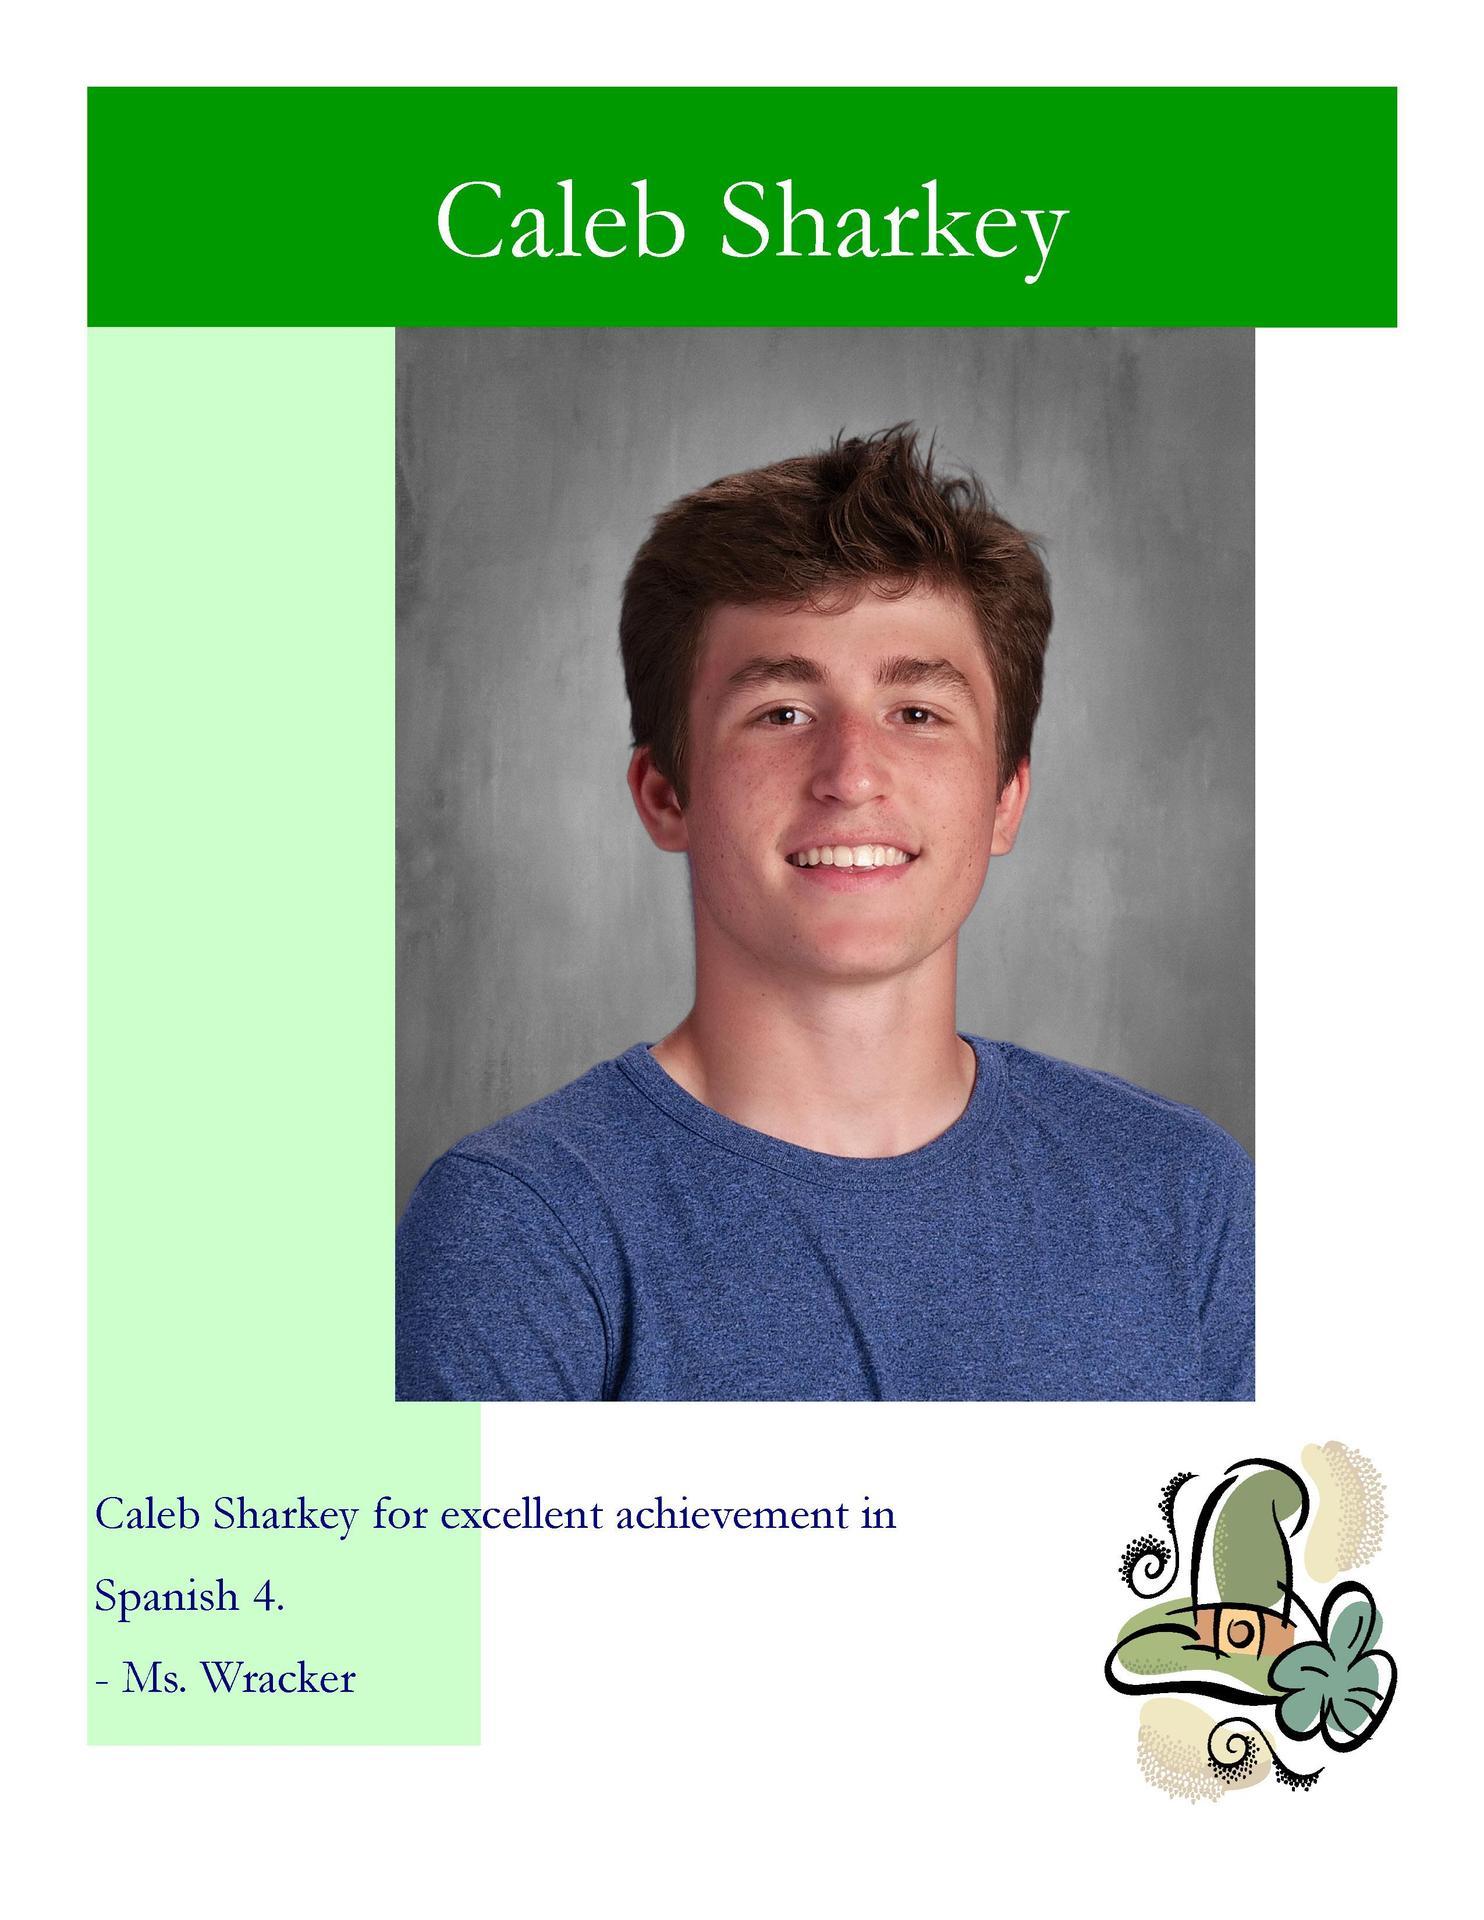 Image of Caleb Sharkey